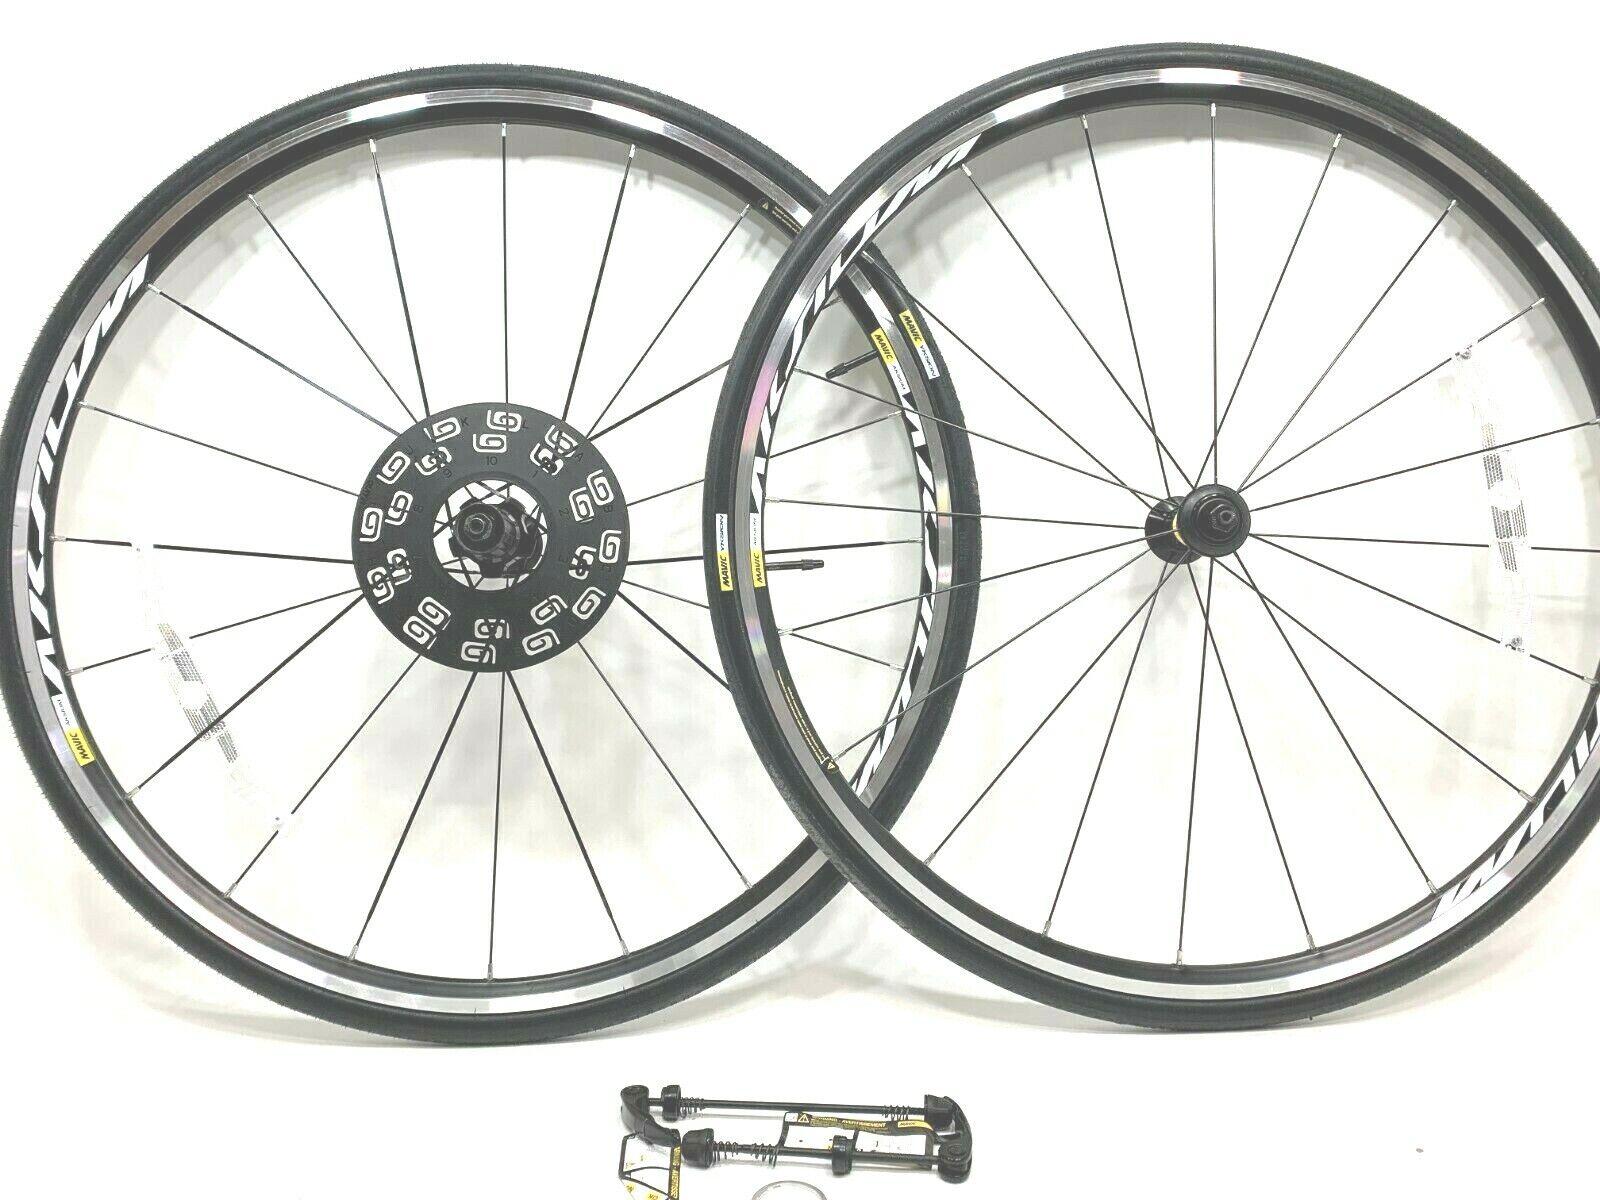 Mavic Aksium Rim Brake Road Bike Wheelset Yksion 25C Tires 700C 10 11 Speed NEW